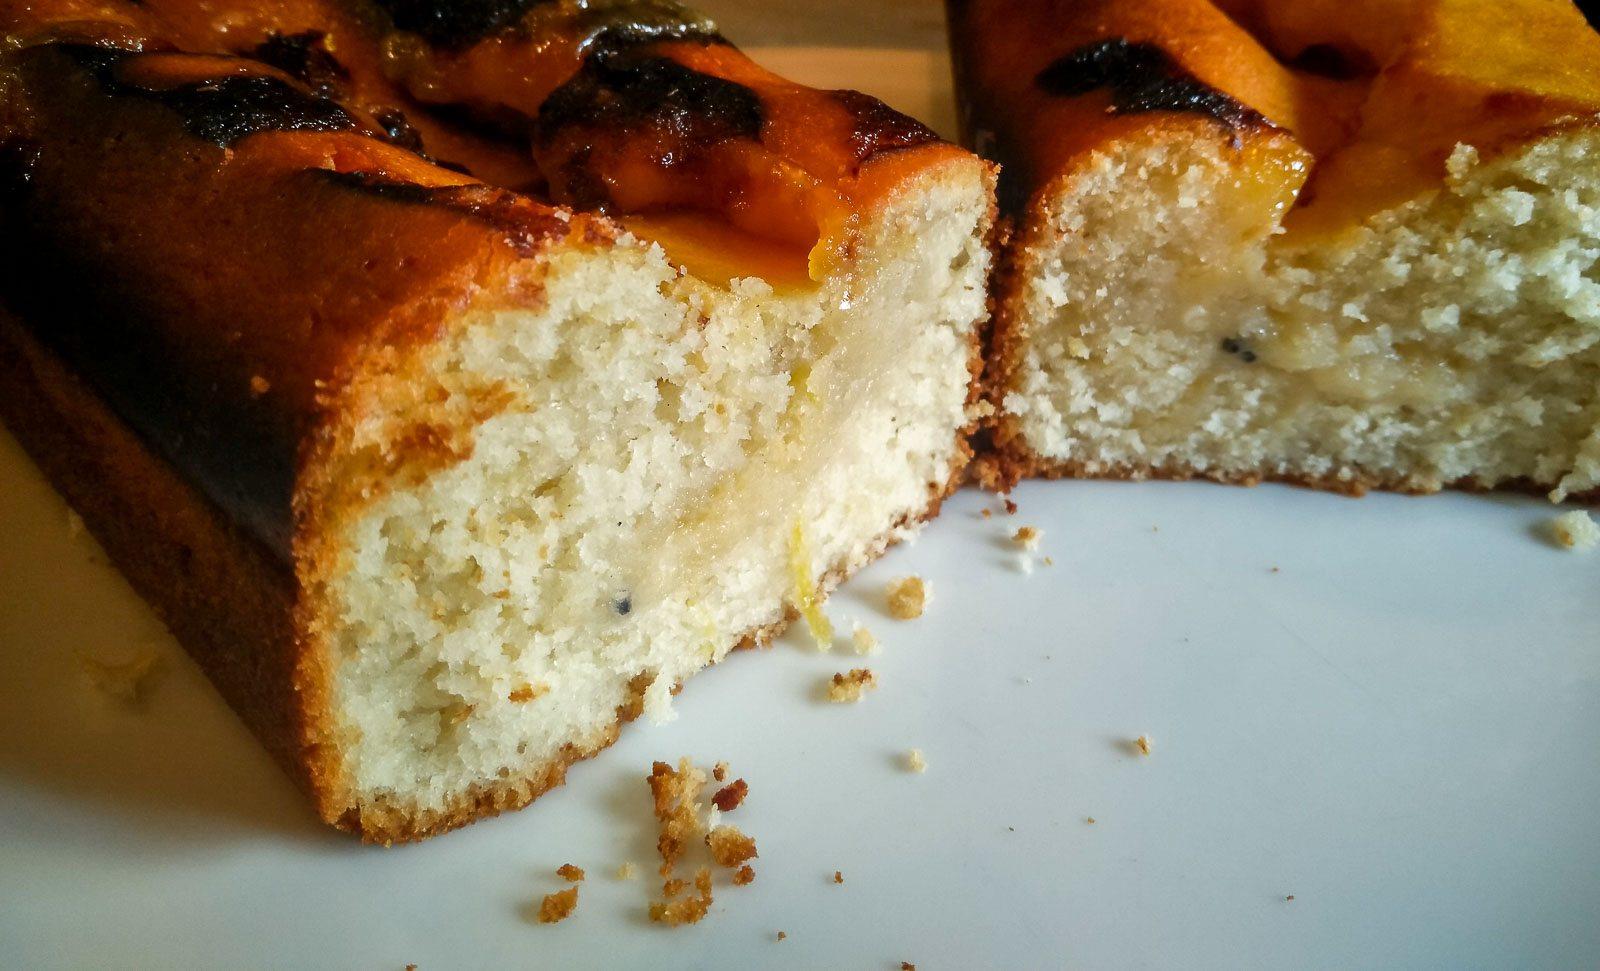 Cardamom infused Lemon Curd Cake (23 of 23)